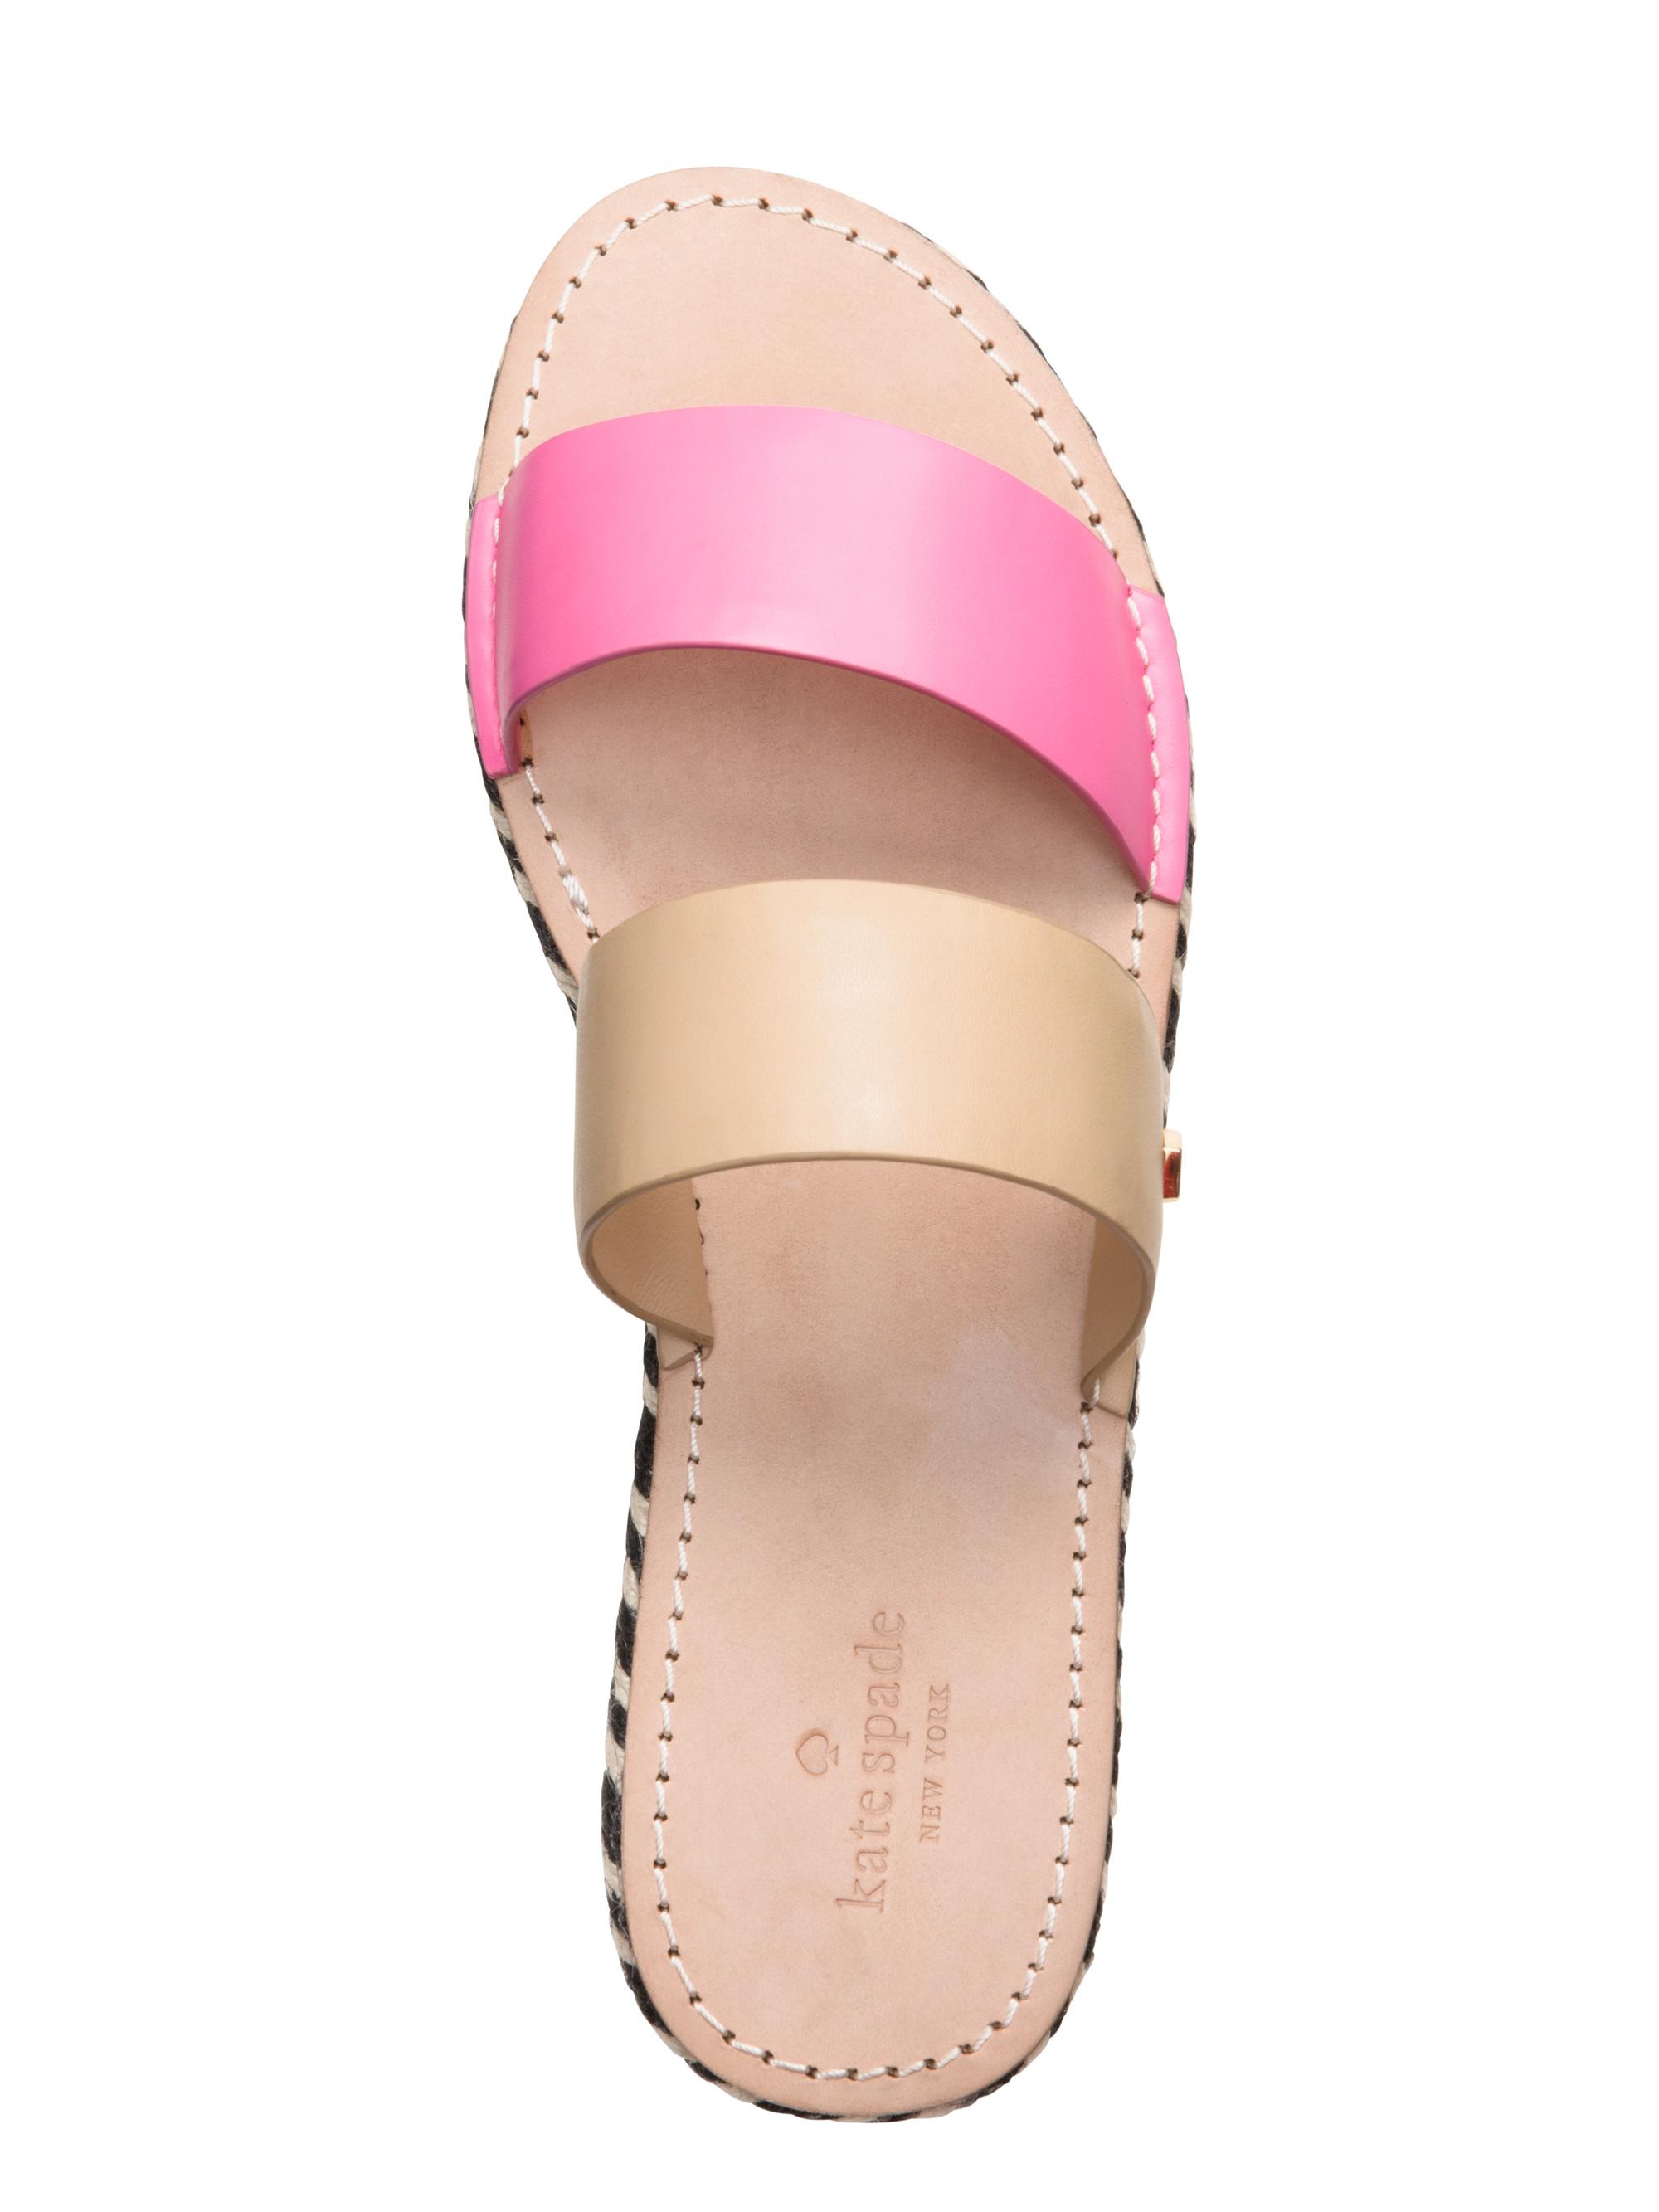 Kate Spade New York Idreena Sandals In Brown Lyst